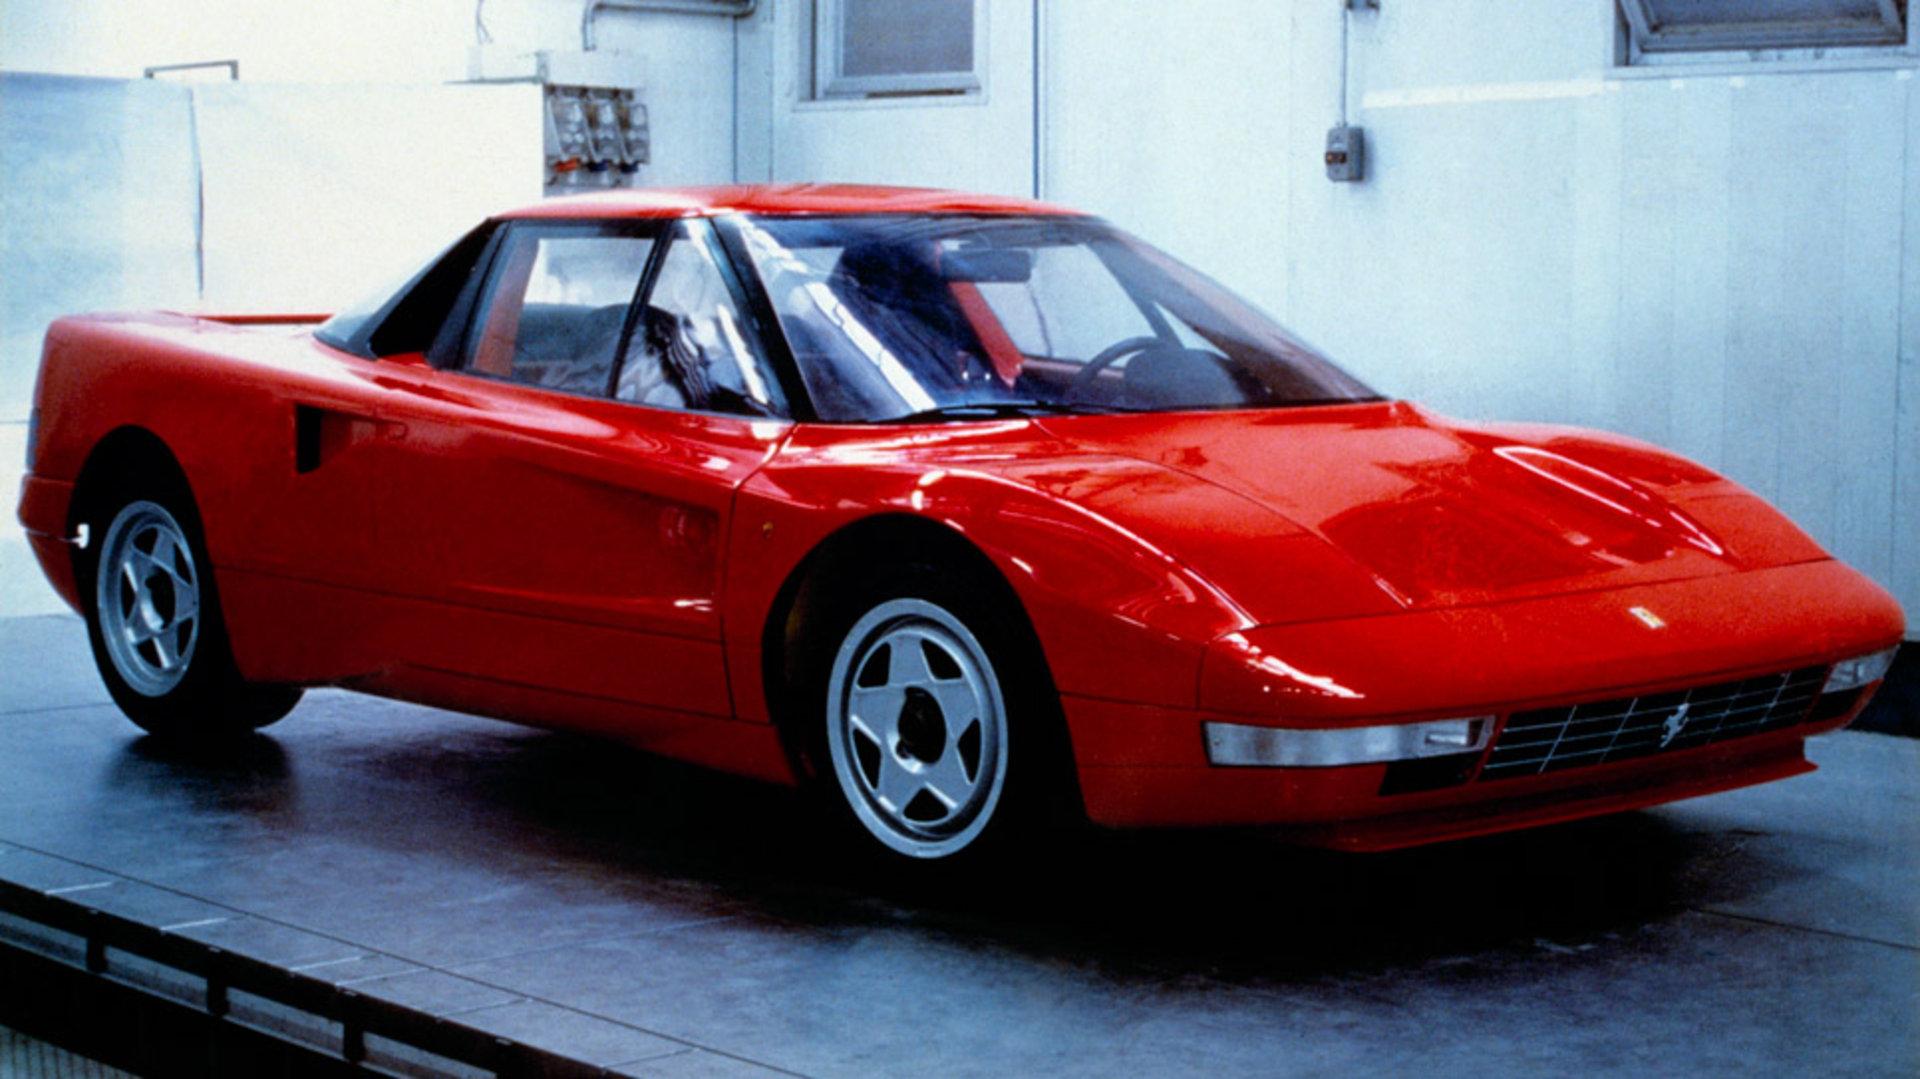 xMAM6731_87275-1920x1080_J1YPTN Extraordinary Ferrari Mondial 3.4 T Review Cars Trend